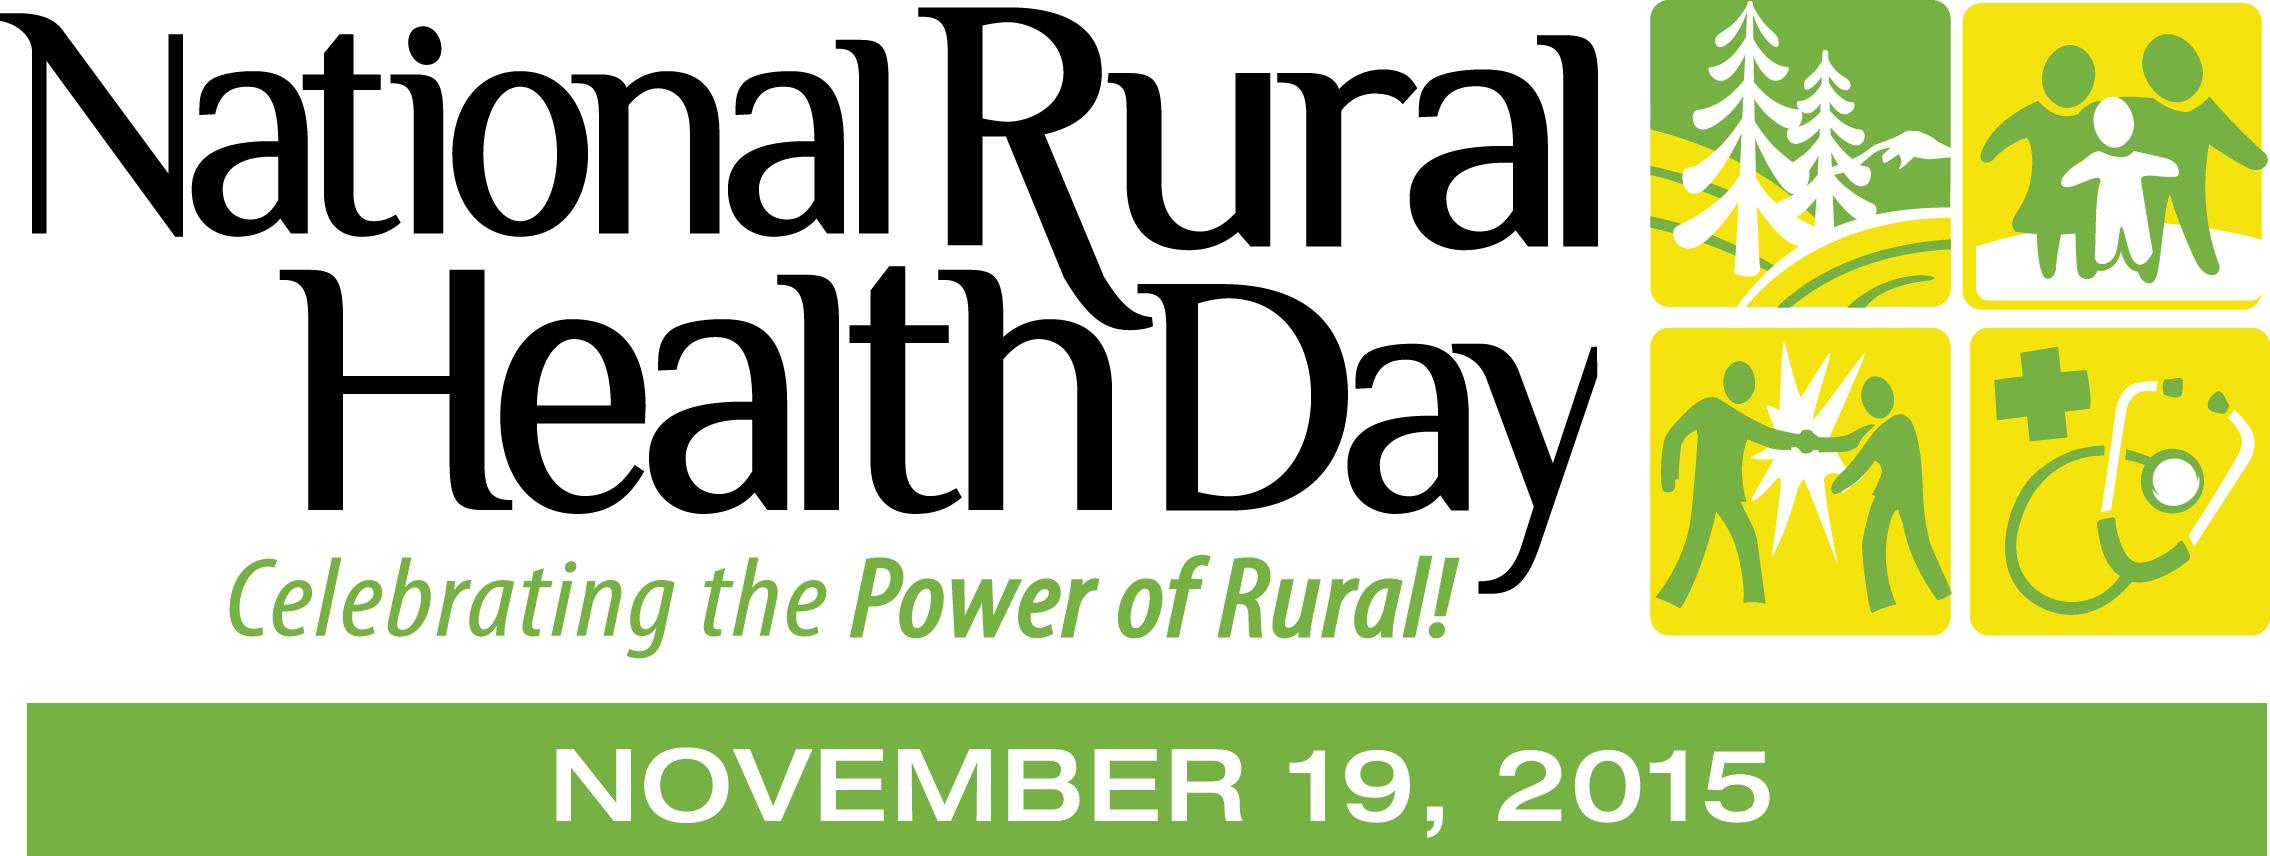 National Rural Health Day Logo for November 19 2015